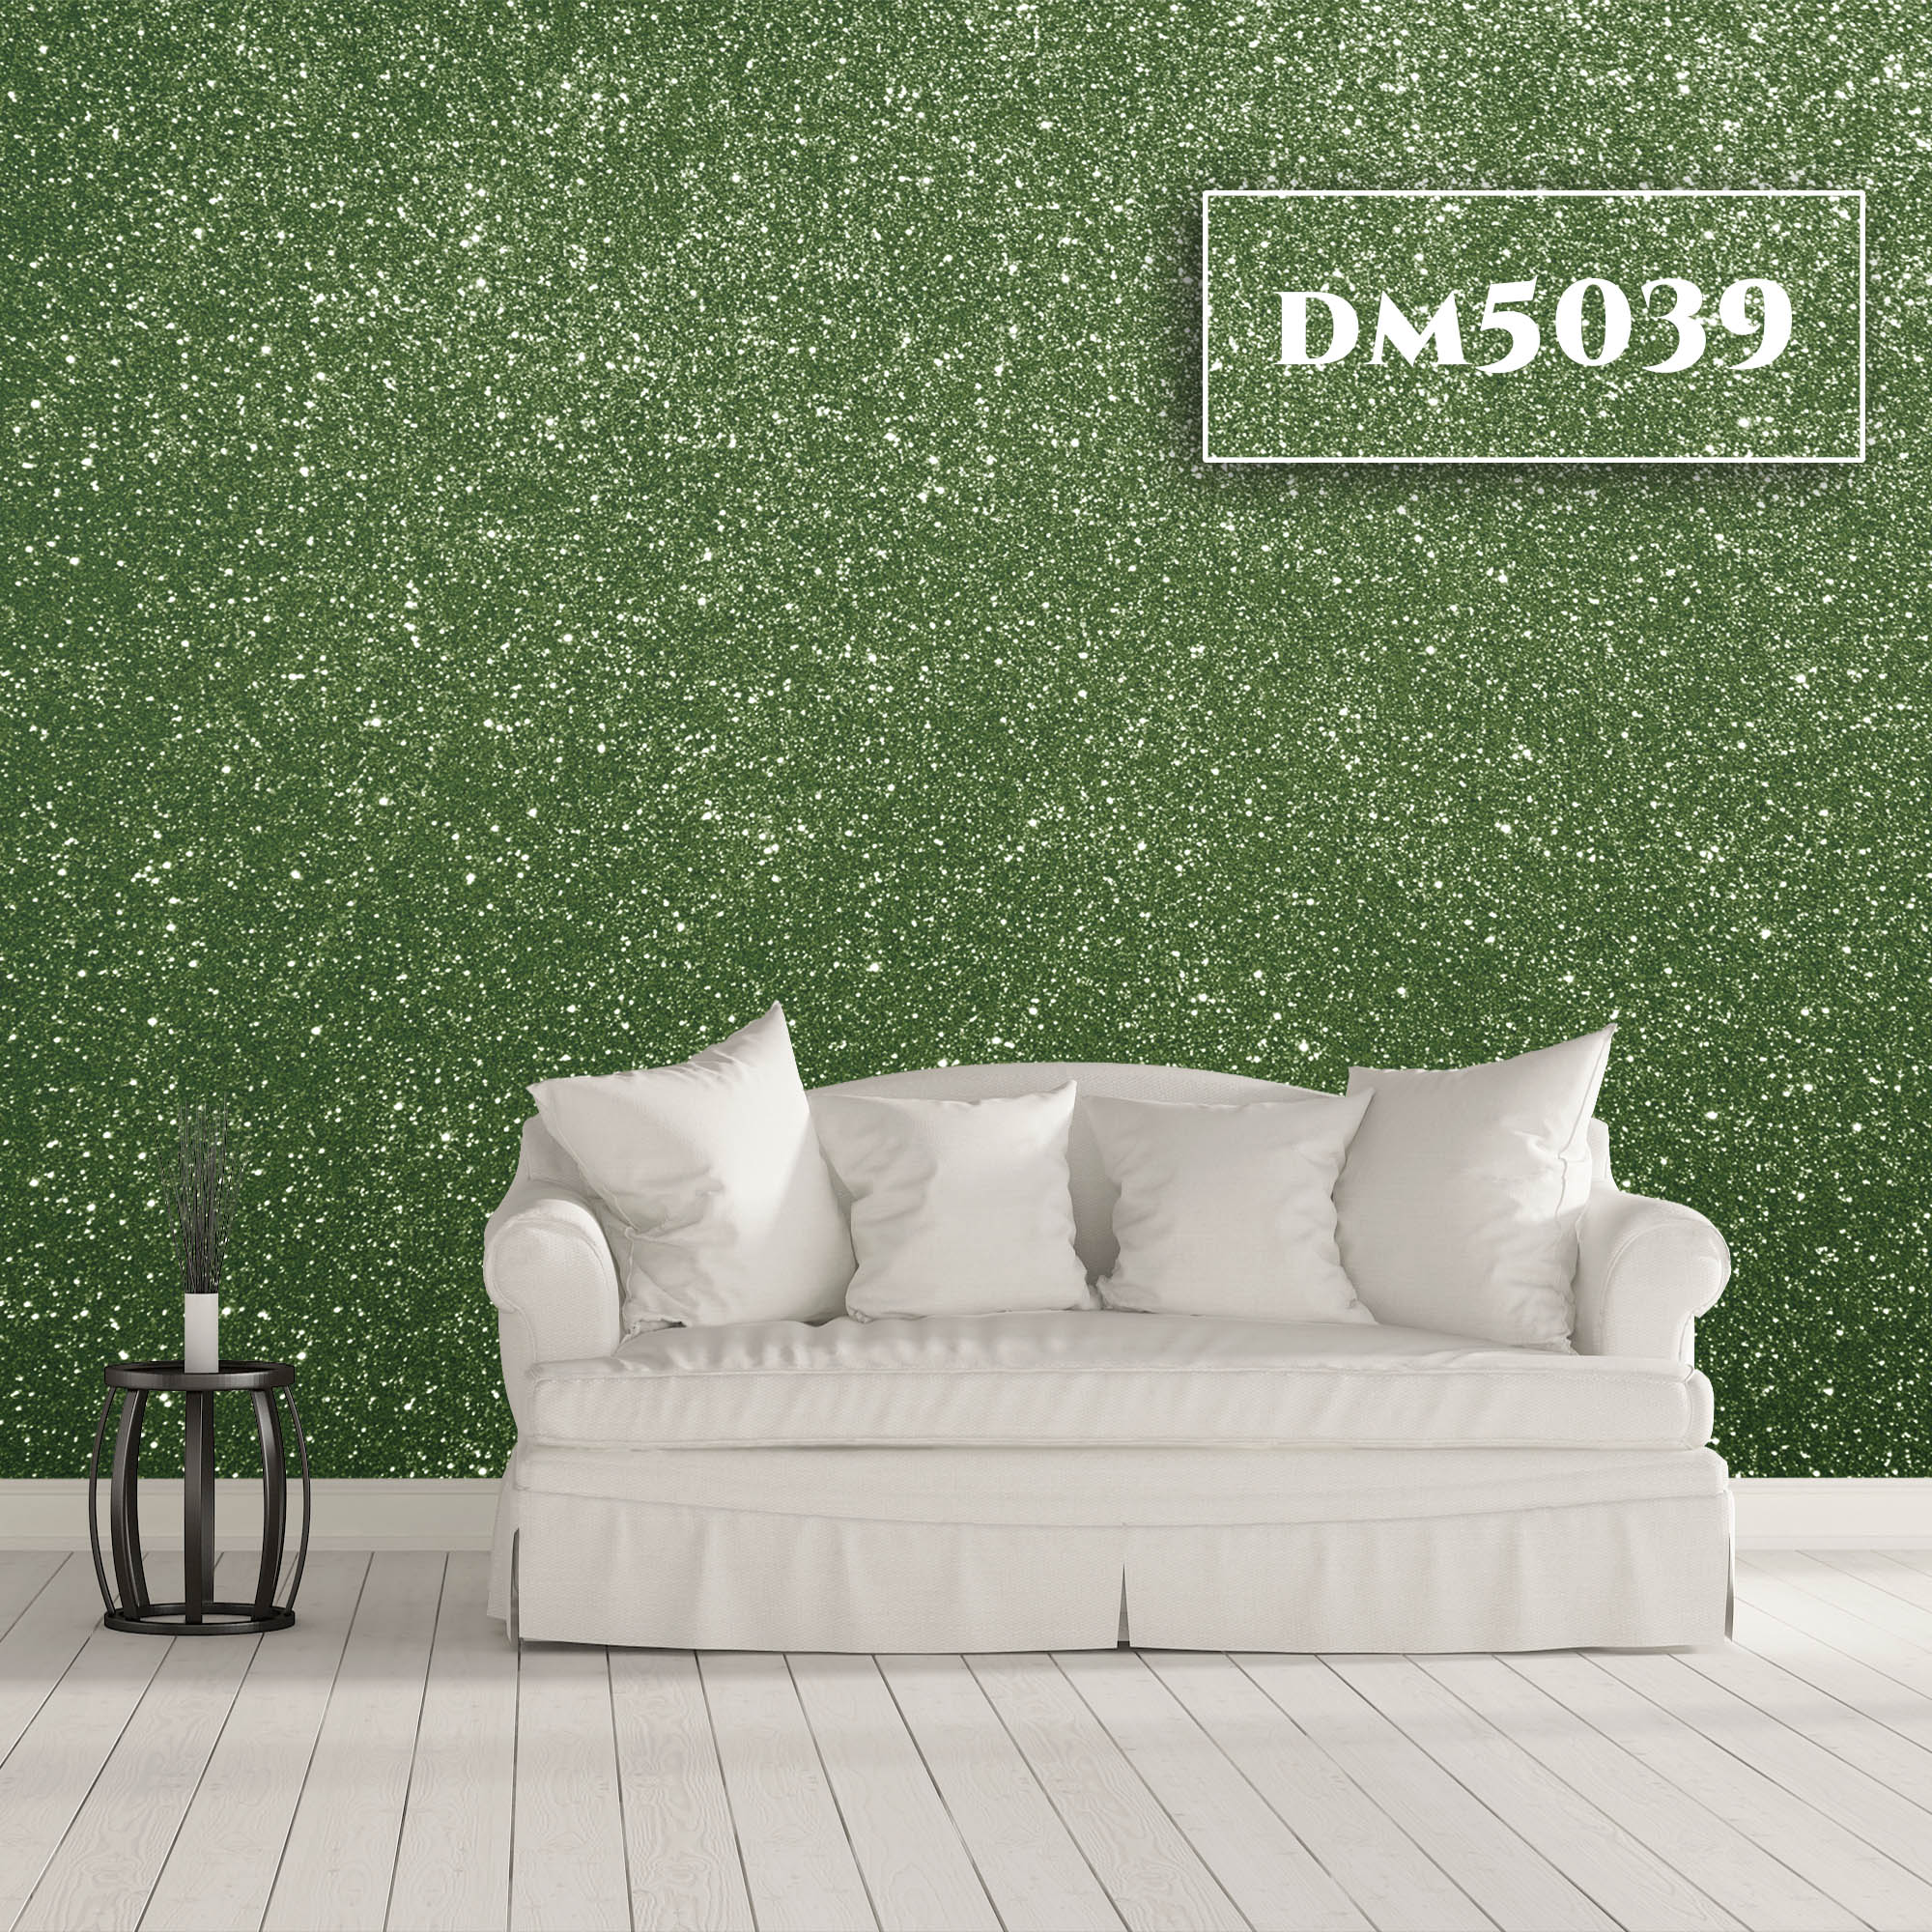 DM5039